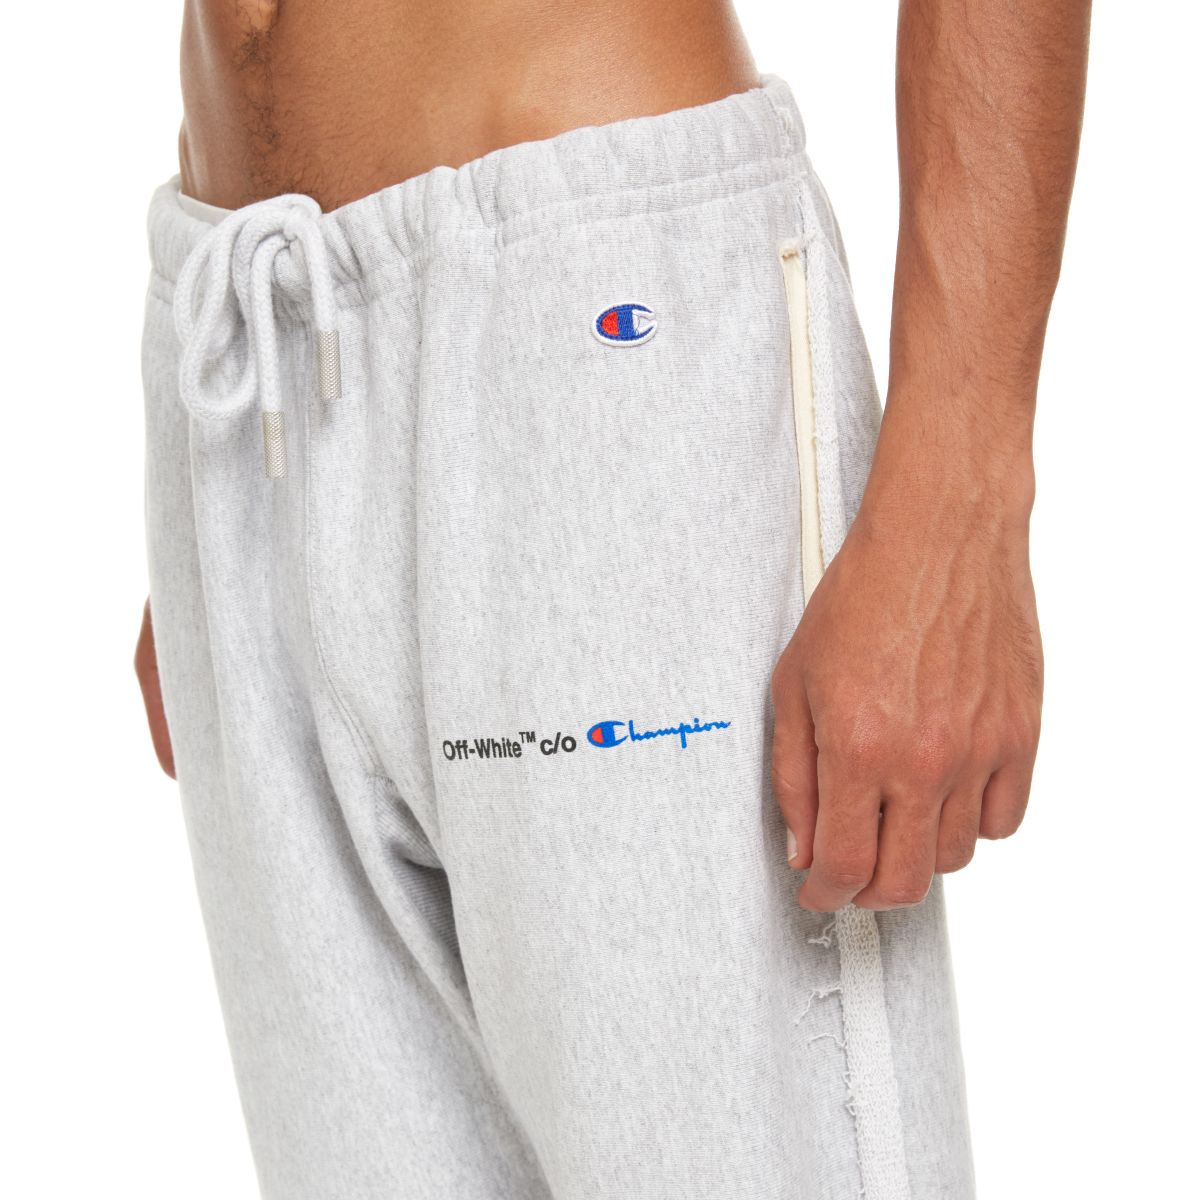 703a159efbc0ce Off-White Off-White Champion Sweatpants - Grey - 9797288 | italist